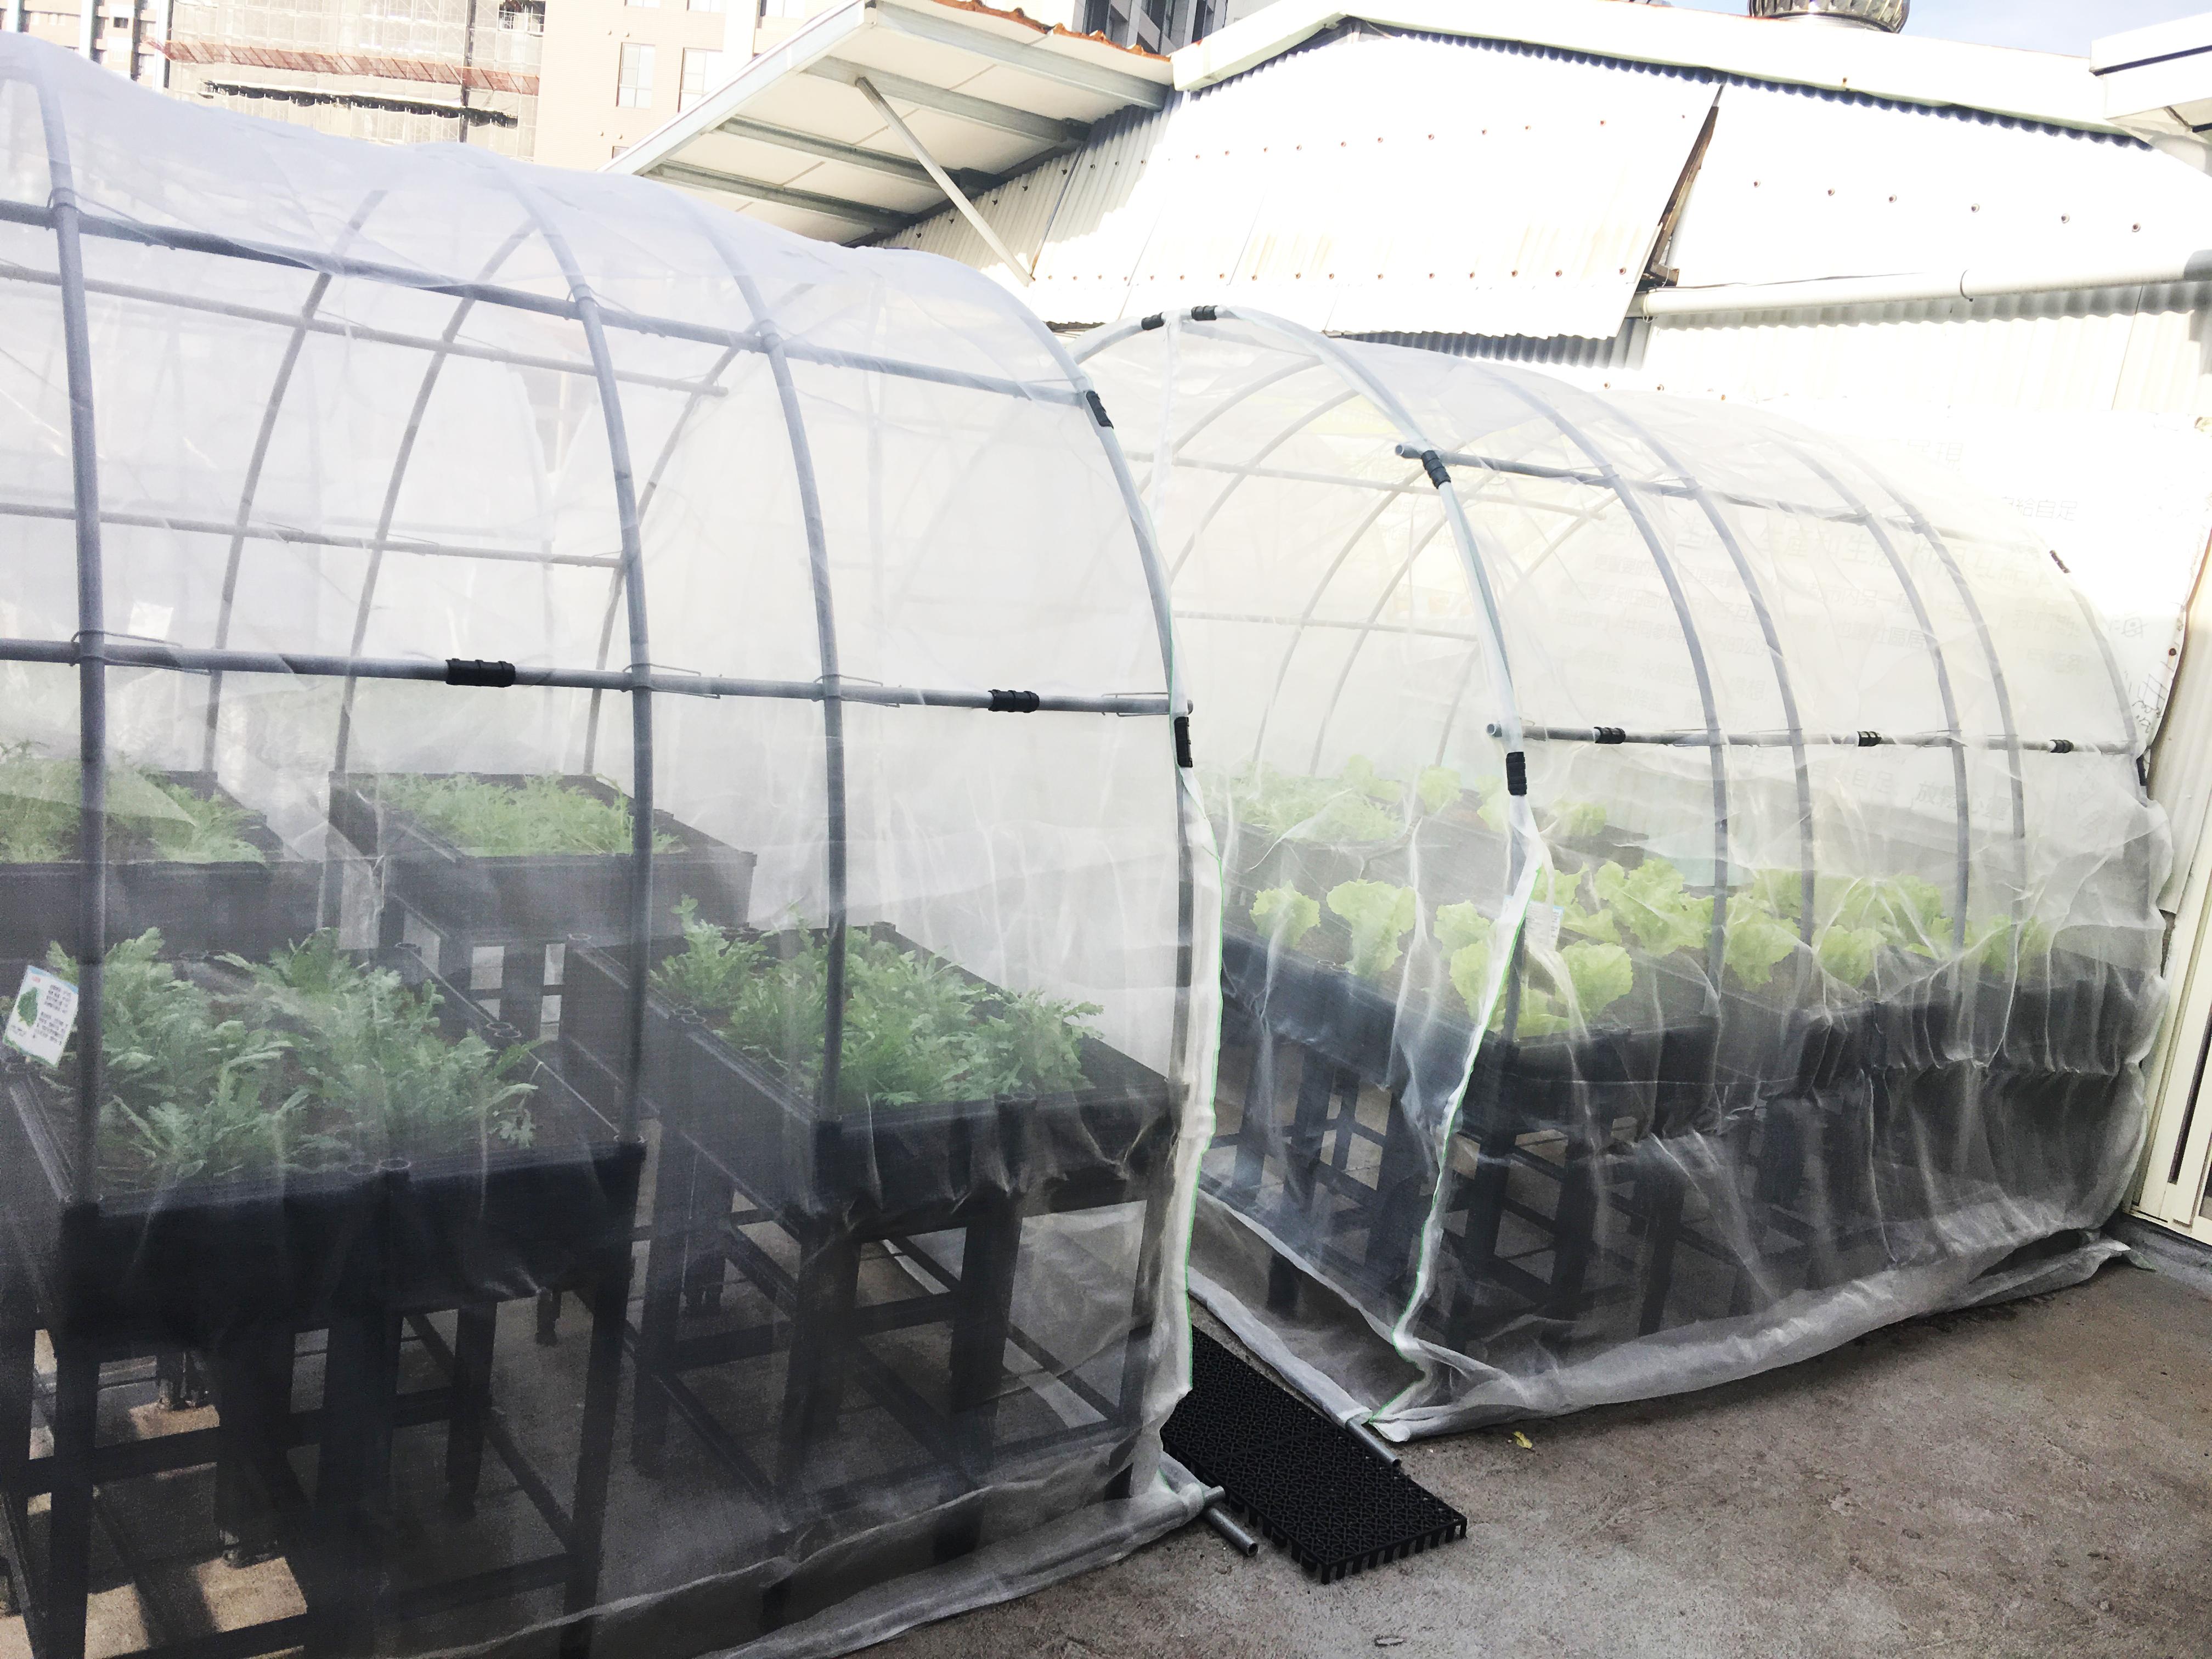 Greenkid Technological Farm Base